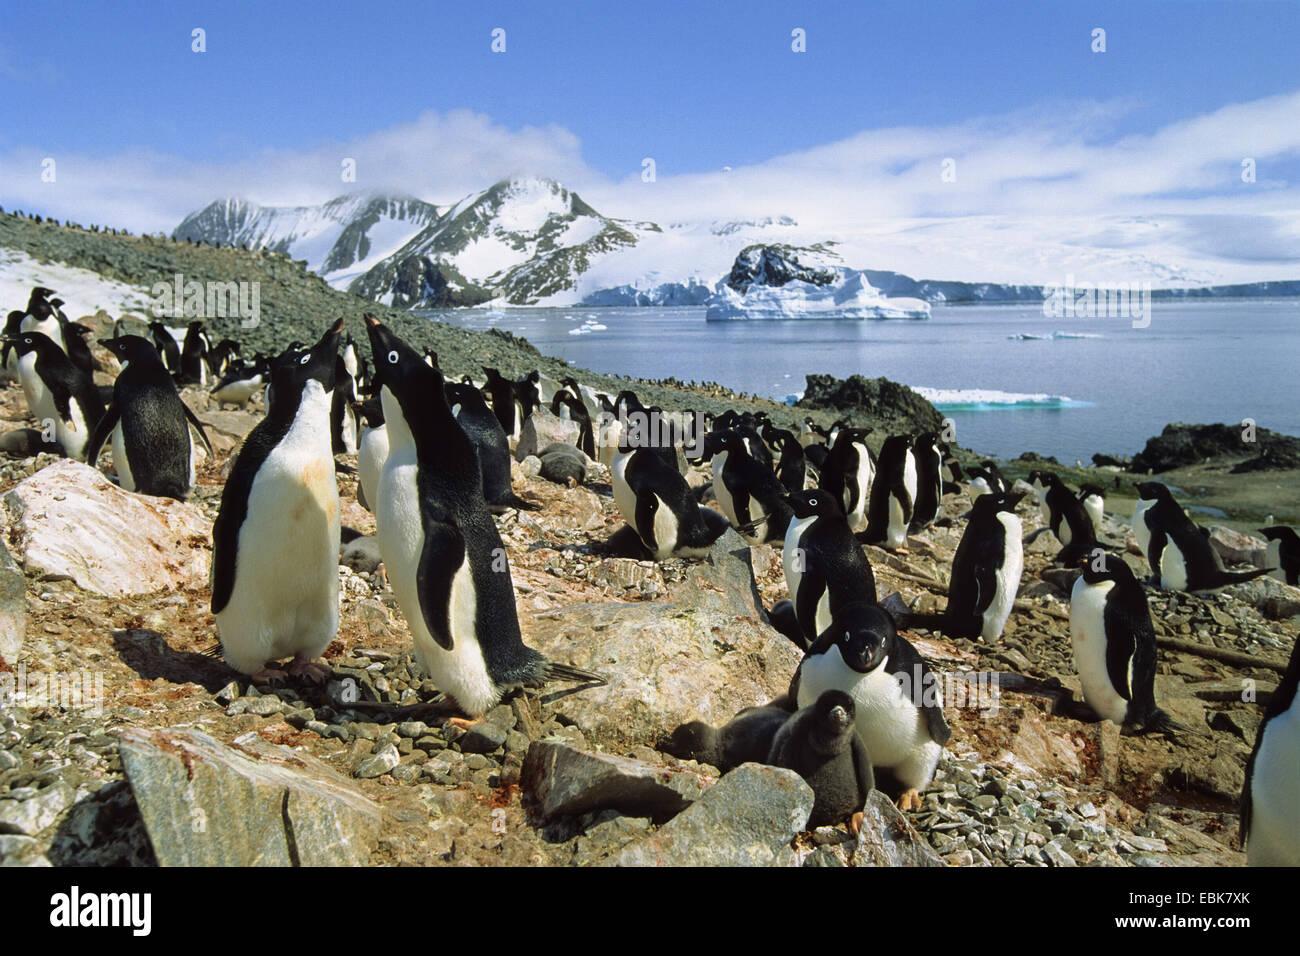 adelie penguin (Pygoscelis adeliae), Adelie Penguins colony, Antarctica, Hope Bay - Stock Image